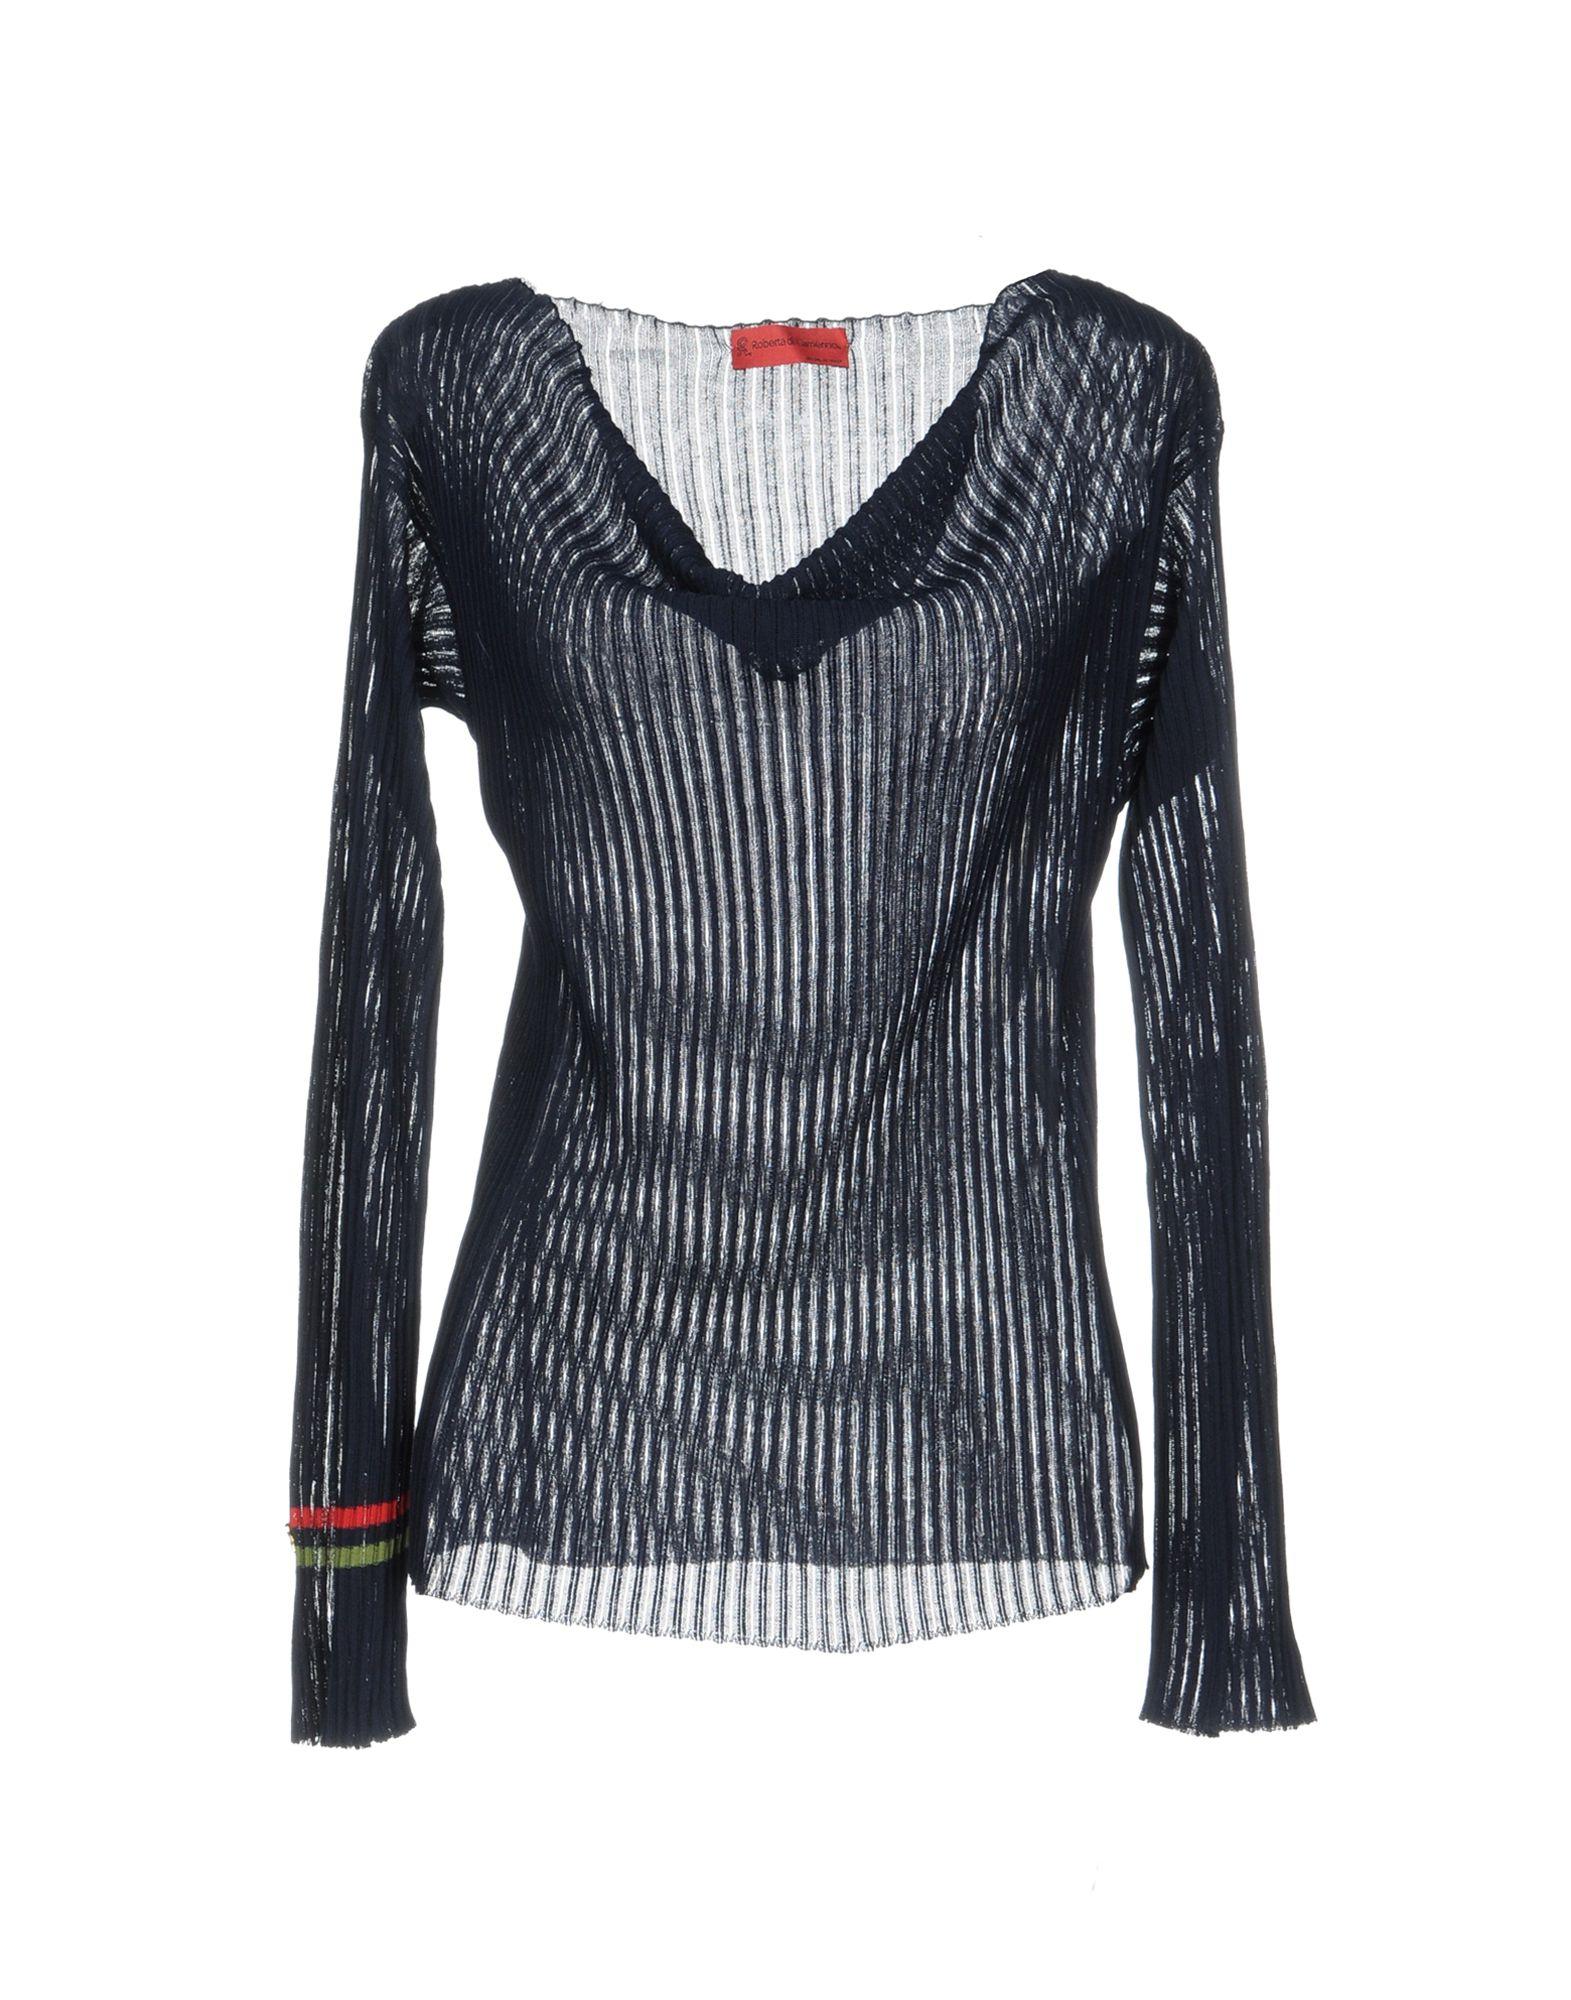 ROBERTA DI CAMERINO Sweater in Dark Blue